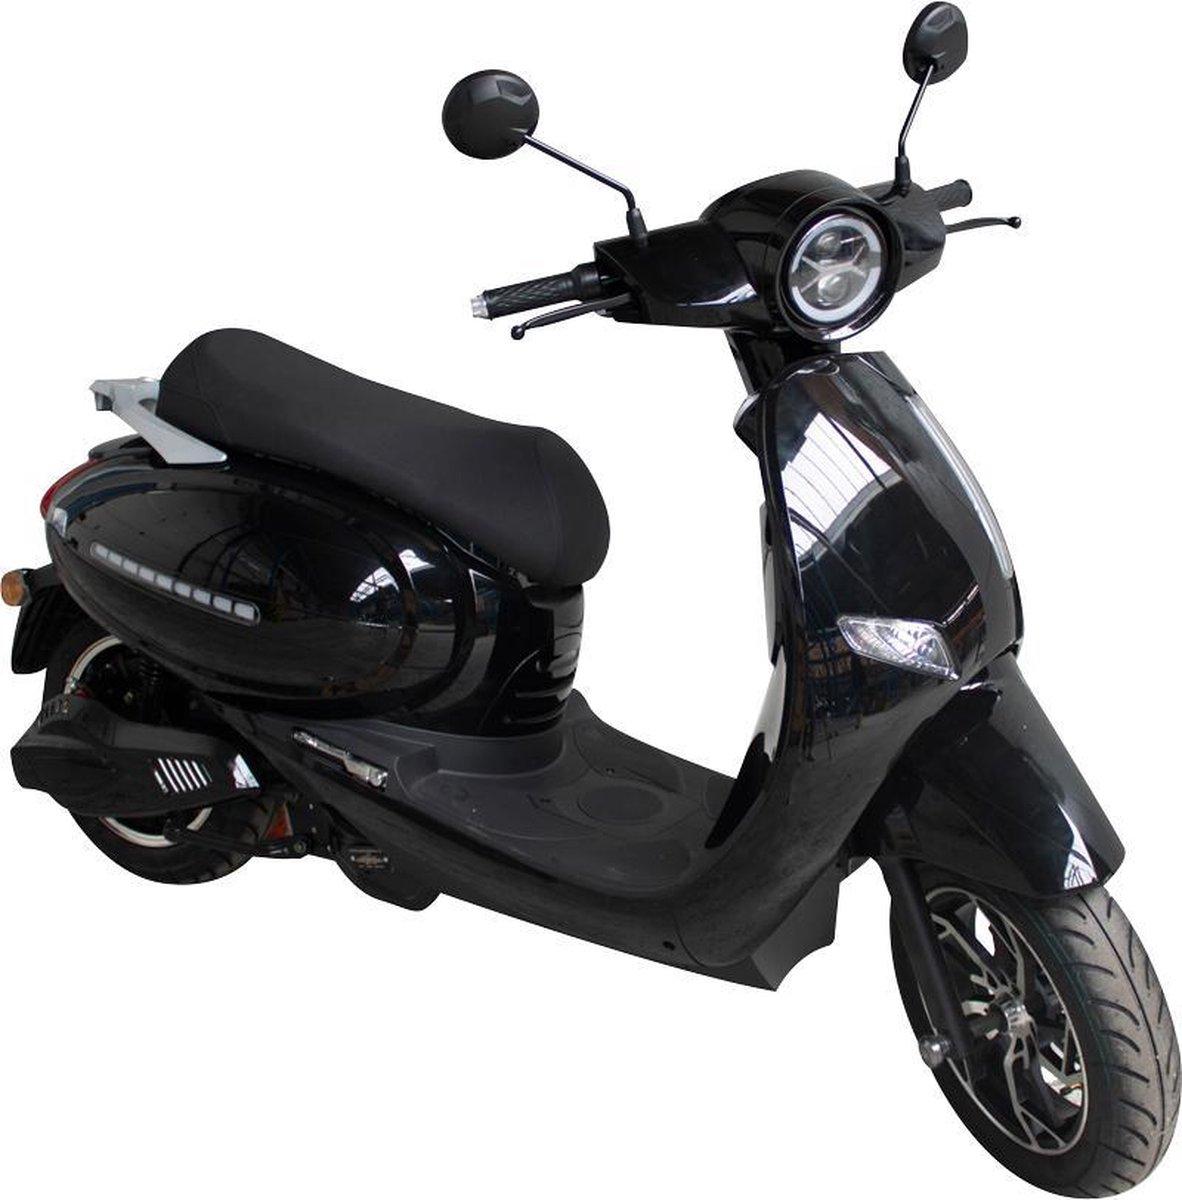 Elephant - City- Elektrische scooter - 25km/h - Actieradius 45km - Zwart